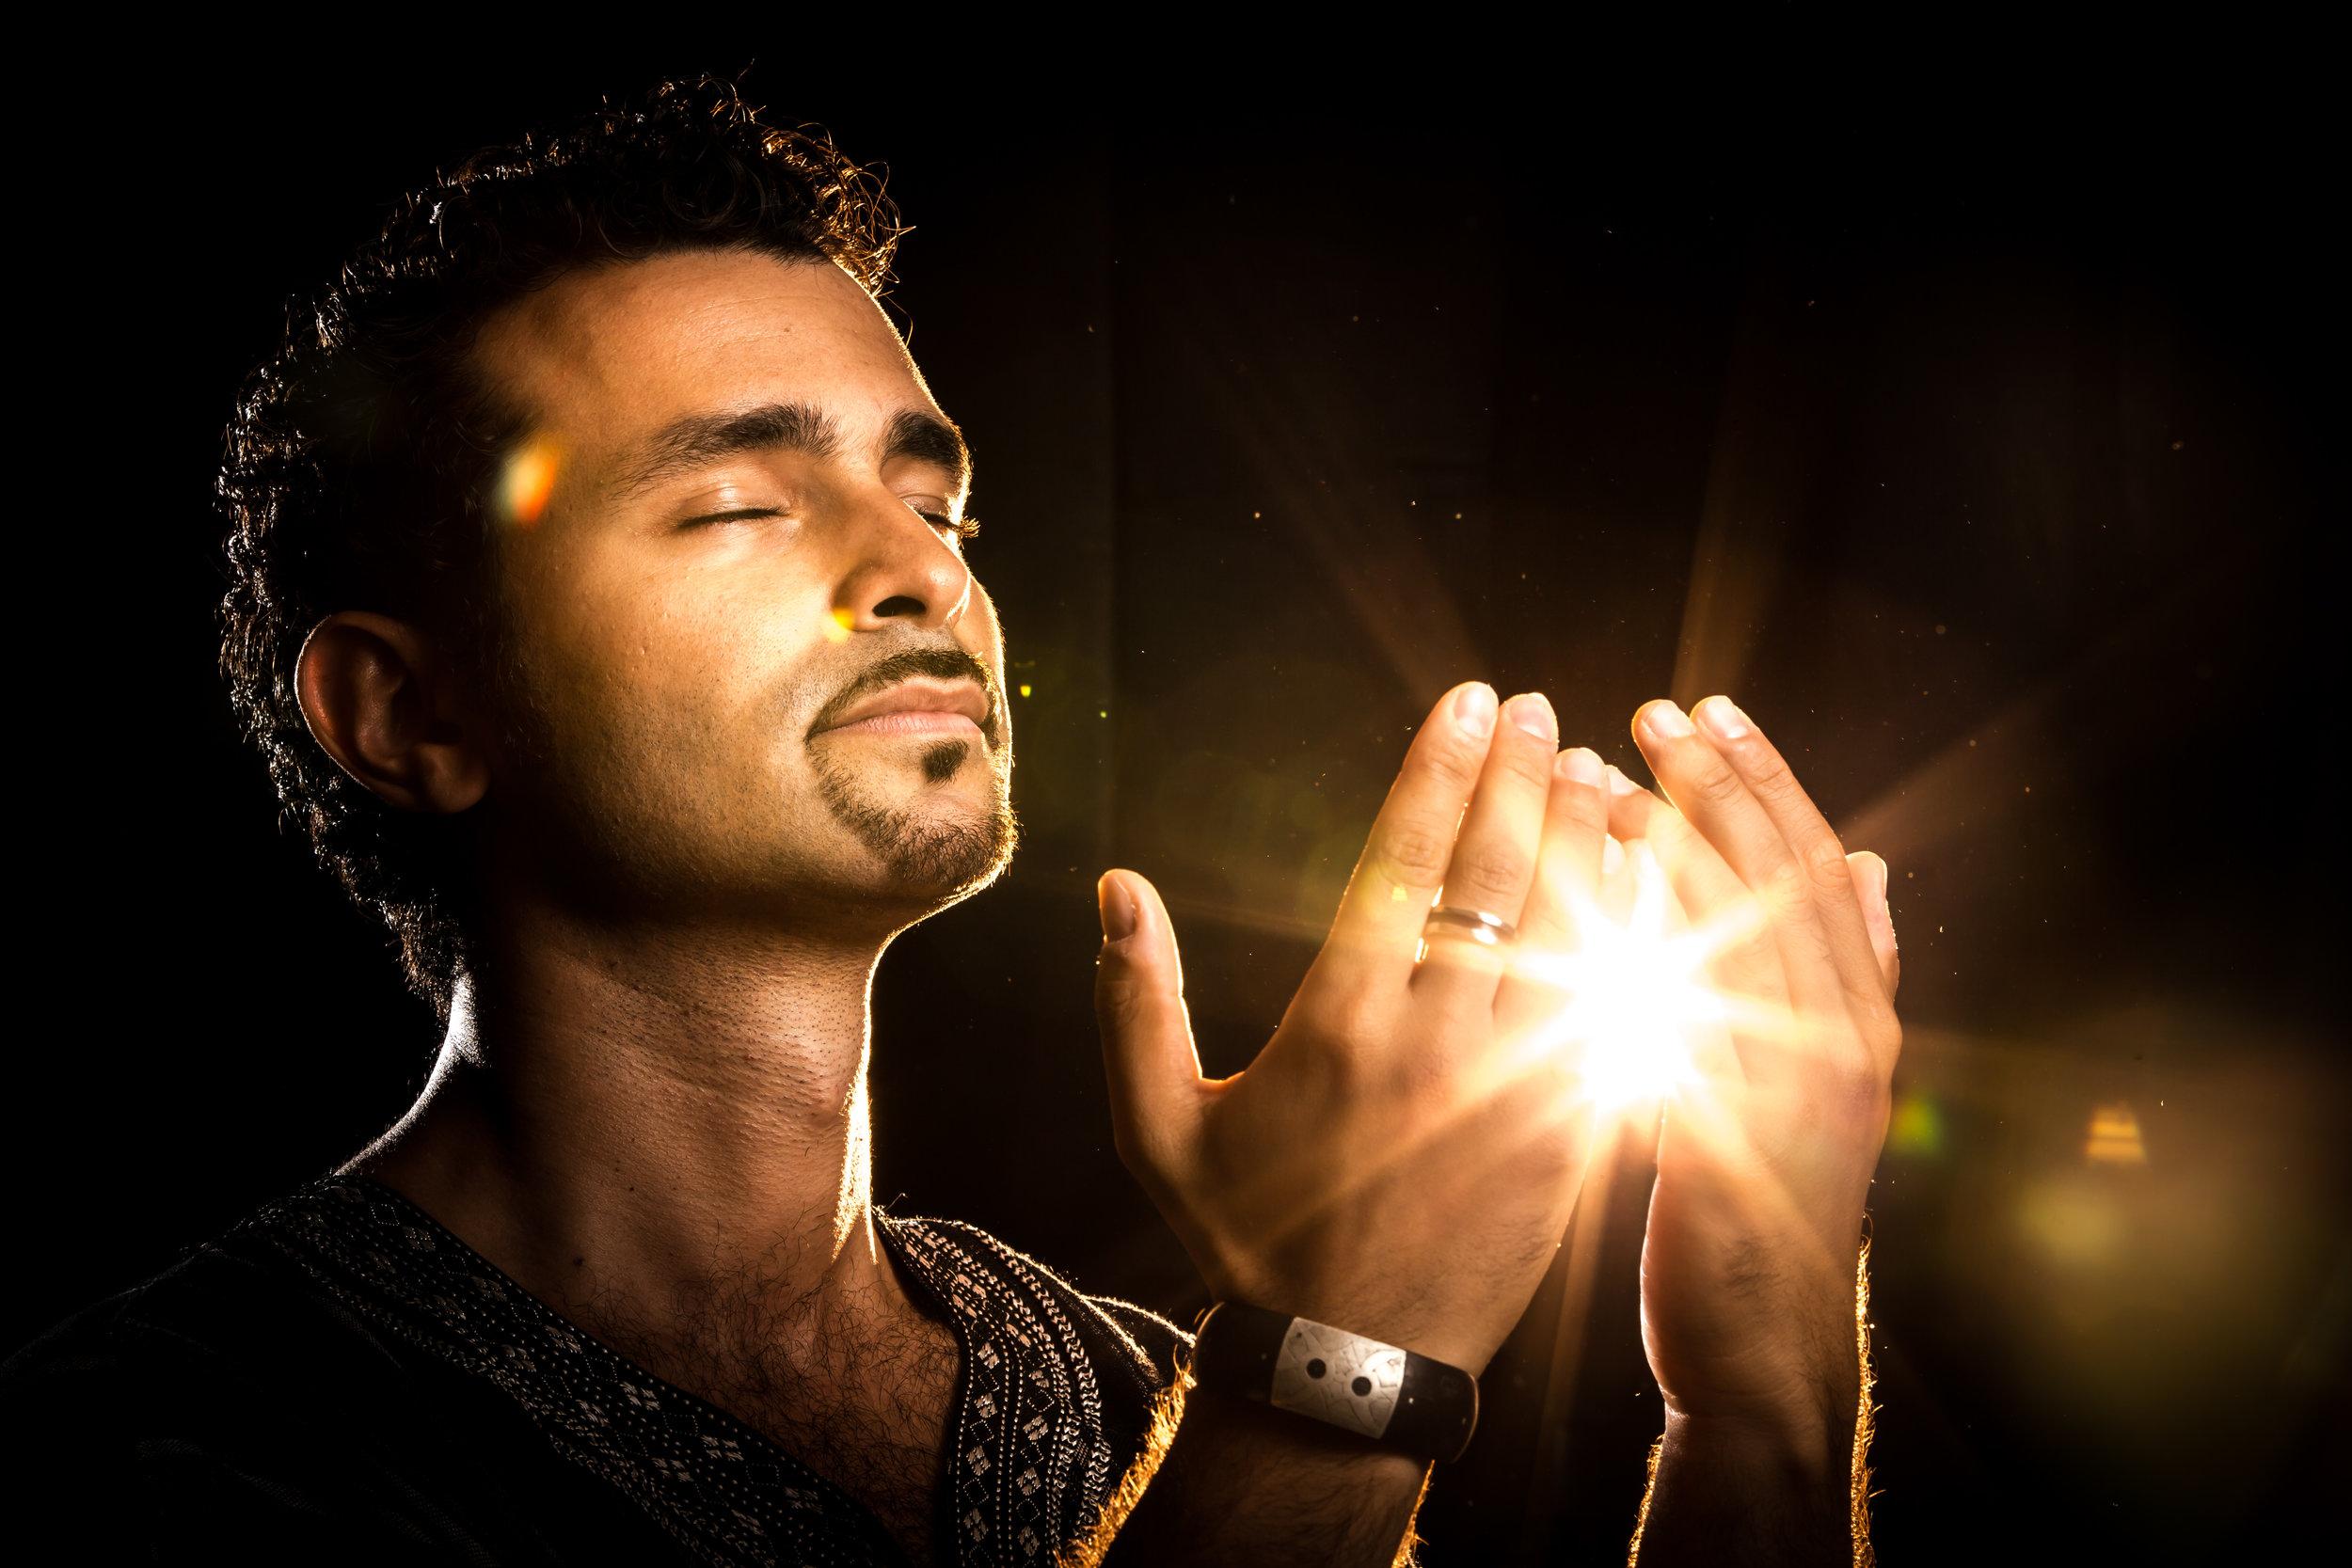 abef60732155-Zakaria_Alaoui__Prayer_.jpg